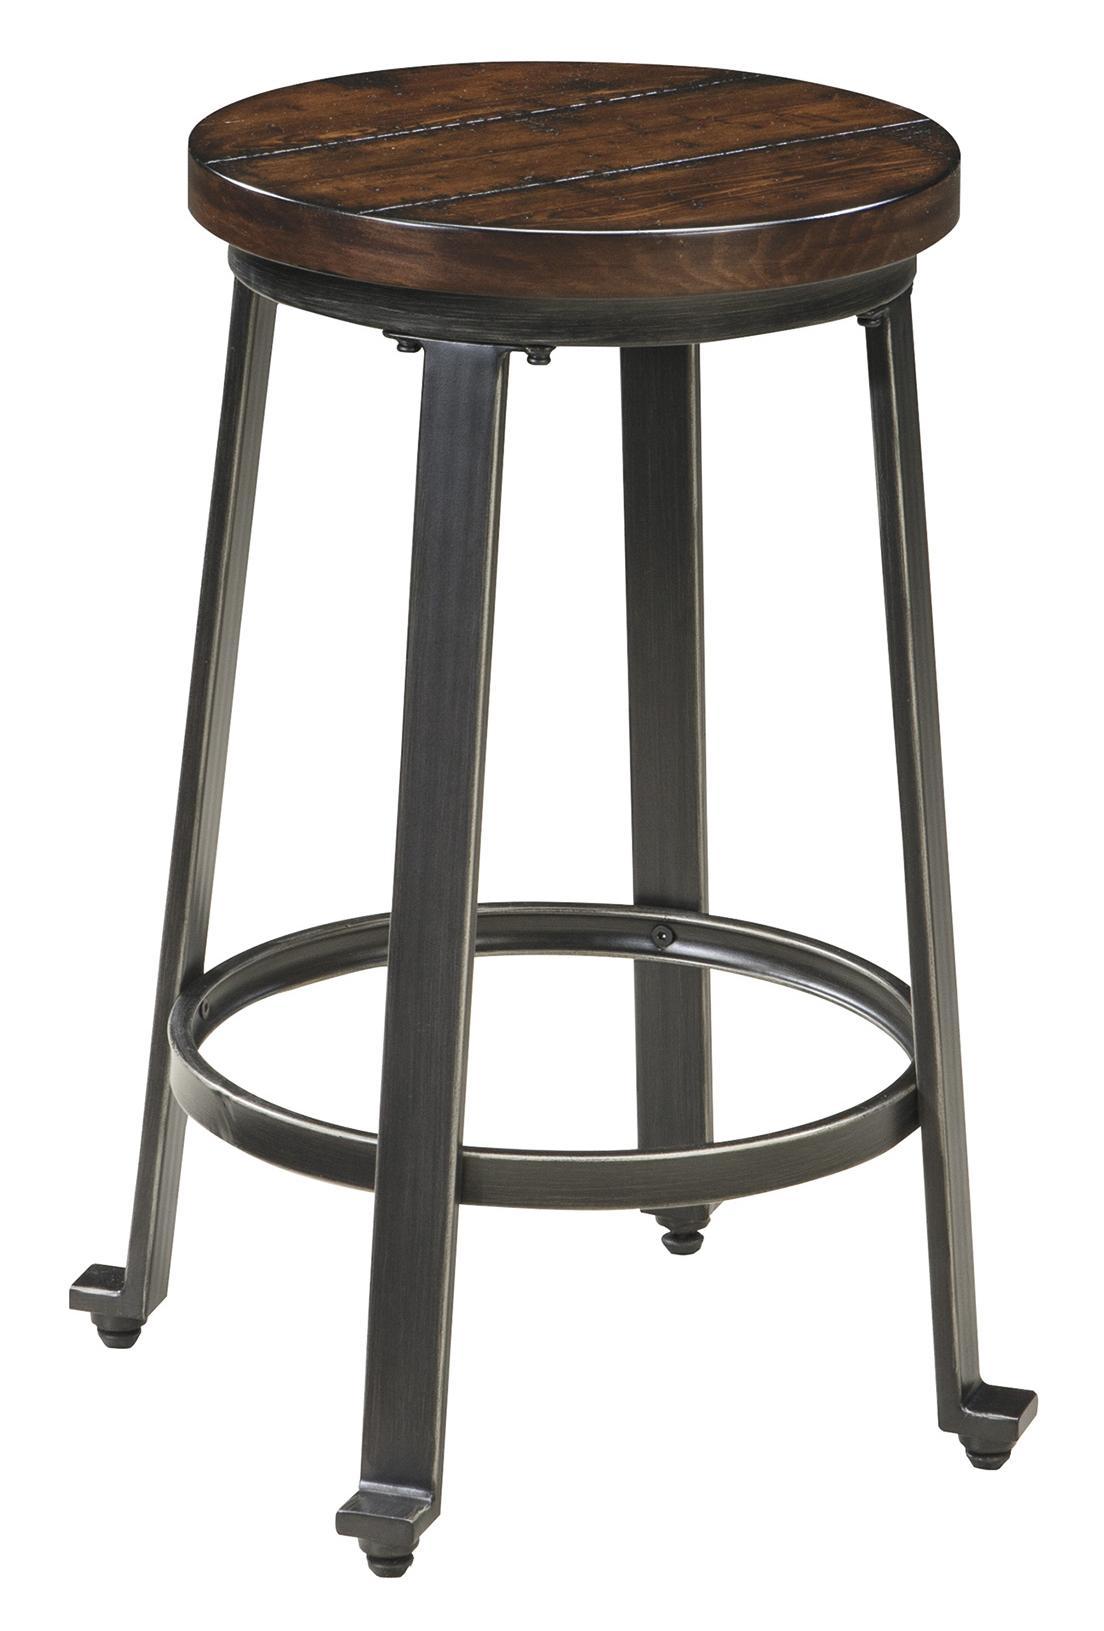 Signature Design By Ashley Challiman 3 Piece Round Counter Table Set Becker Furniture World